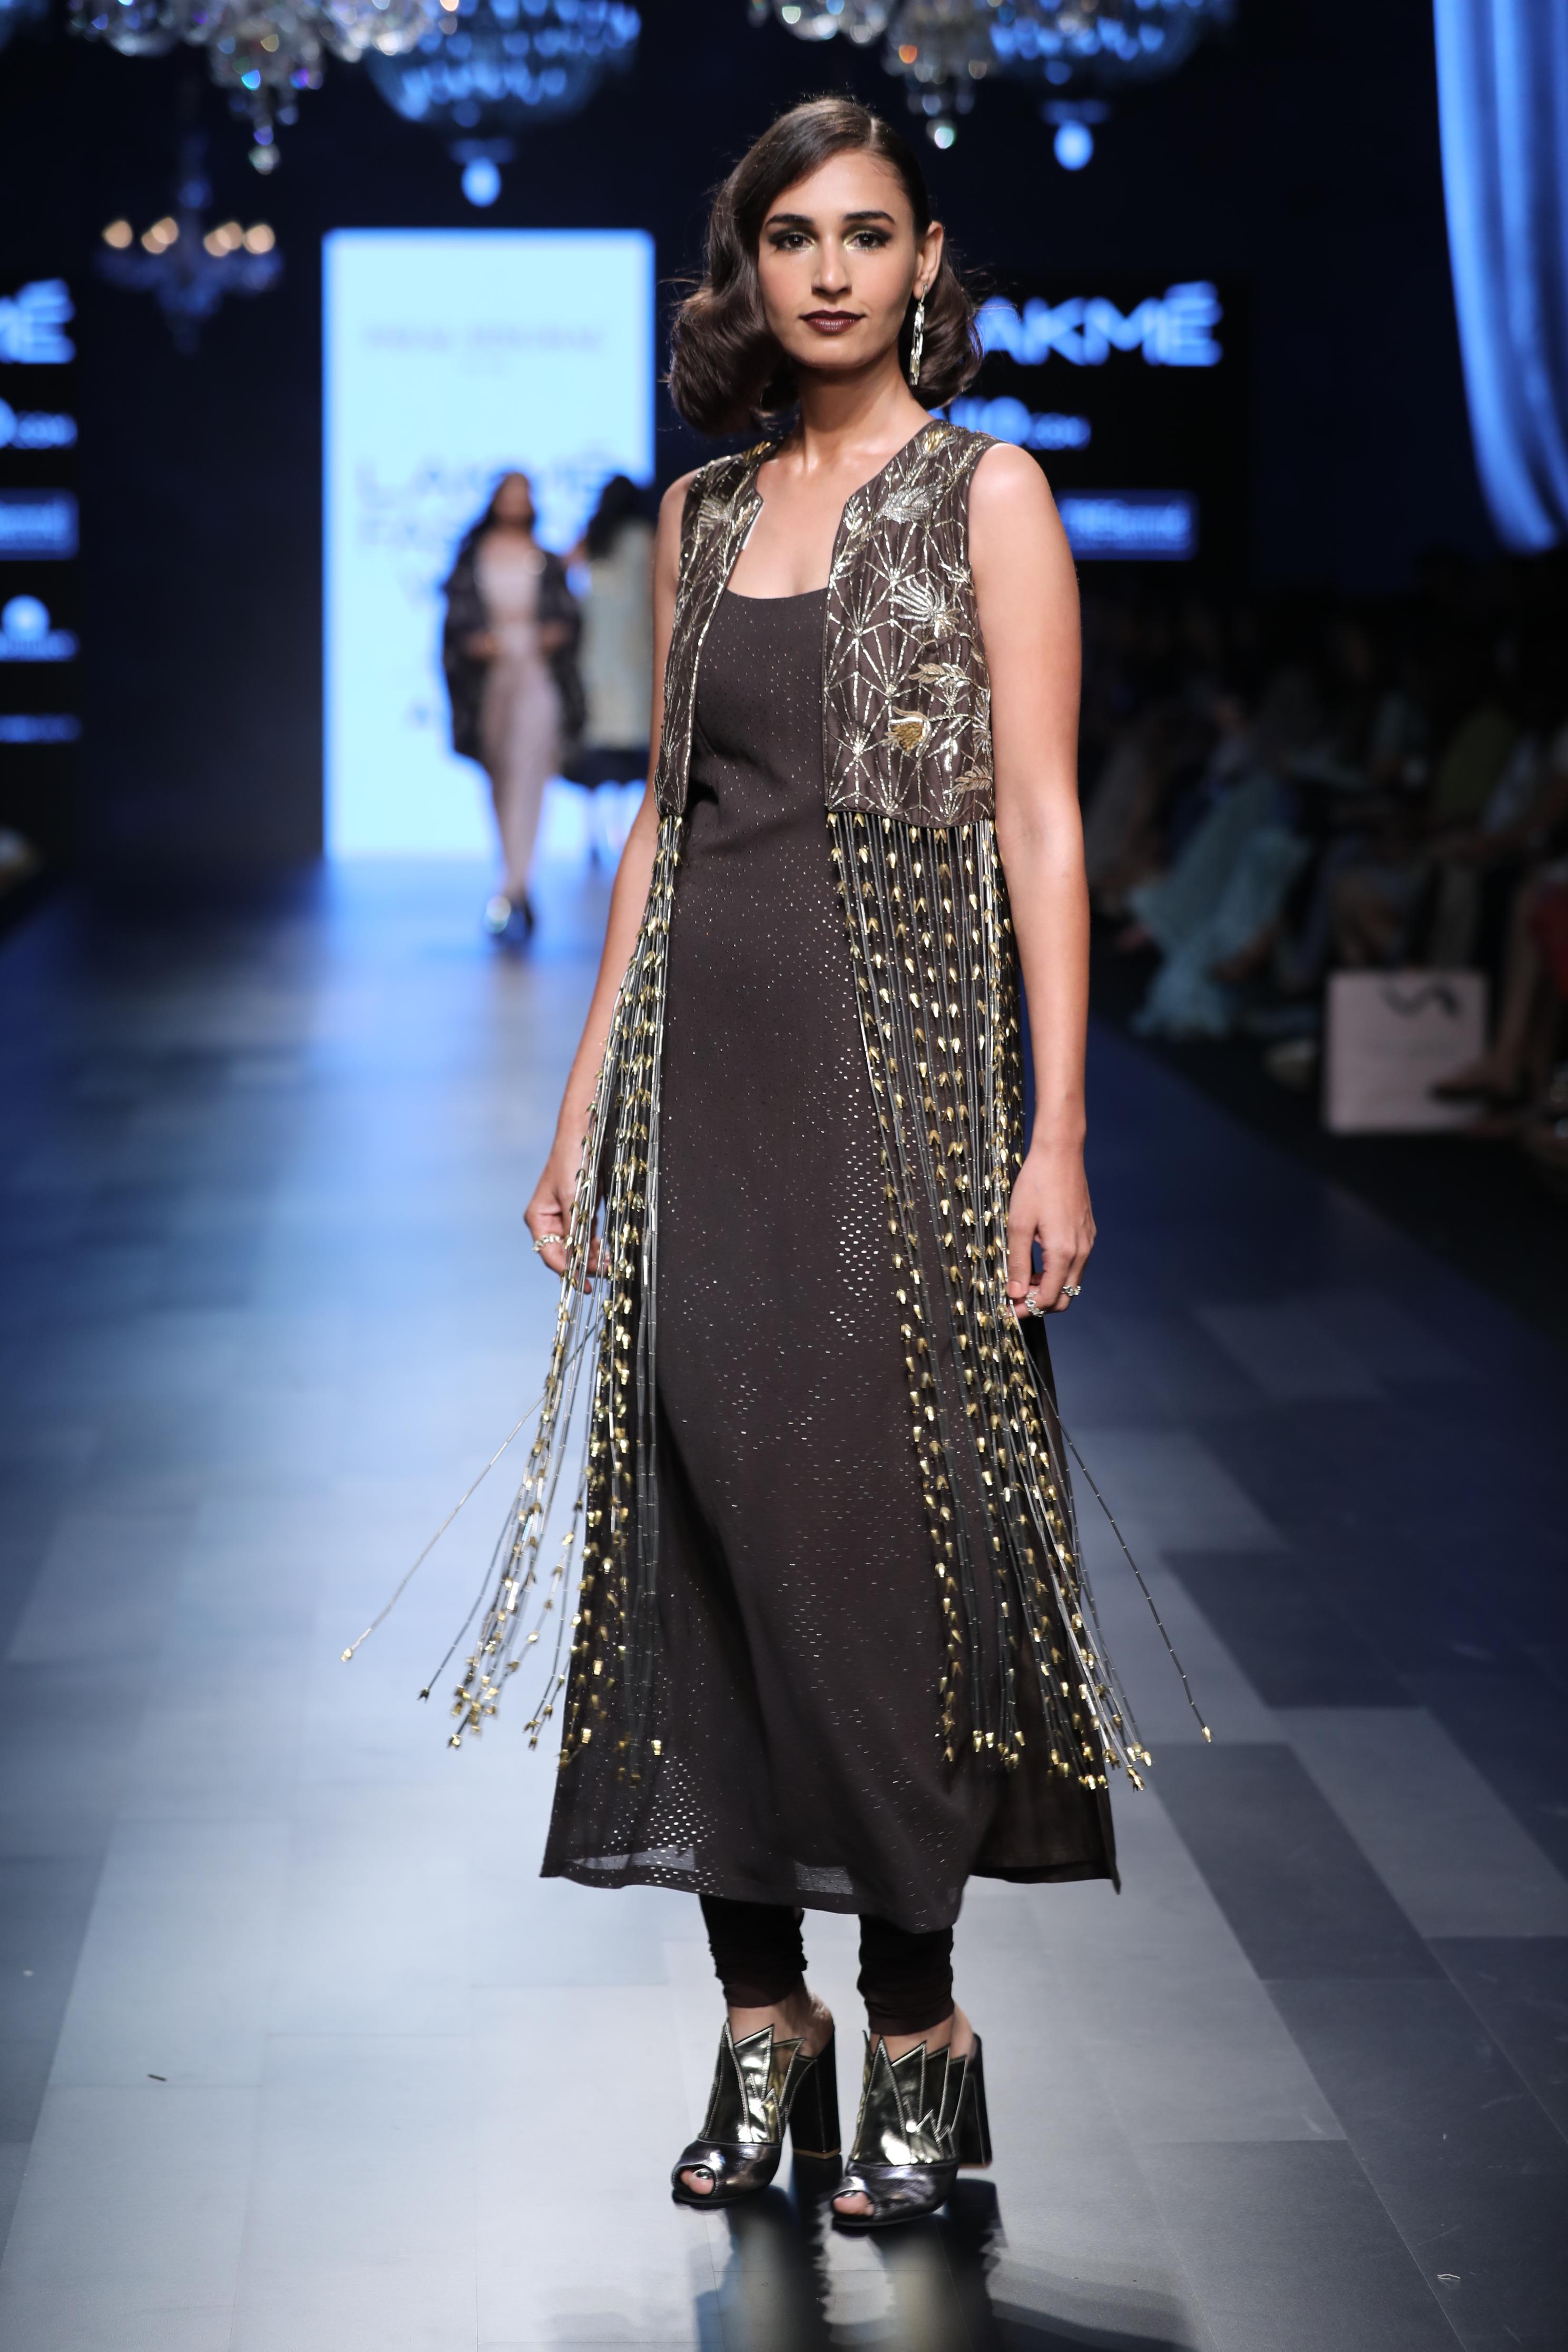 Payal Singhal Lady M - Jewellery by: Isharya - Show Styled by: Nidhi Jacob - Lakmé Fashion Week Summer/Resort 2017